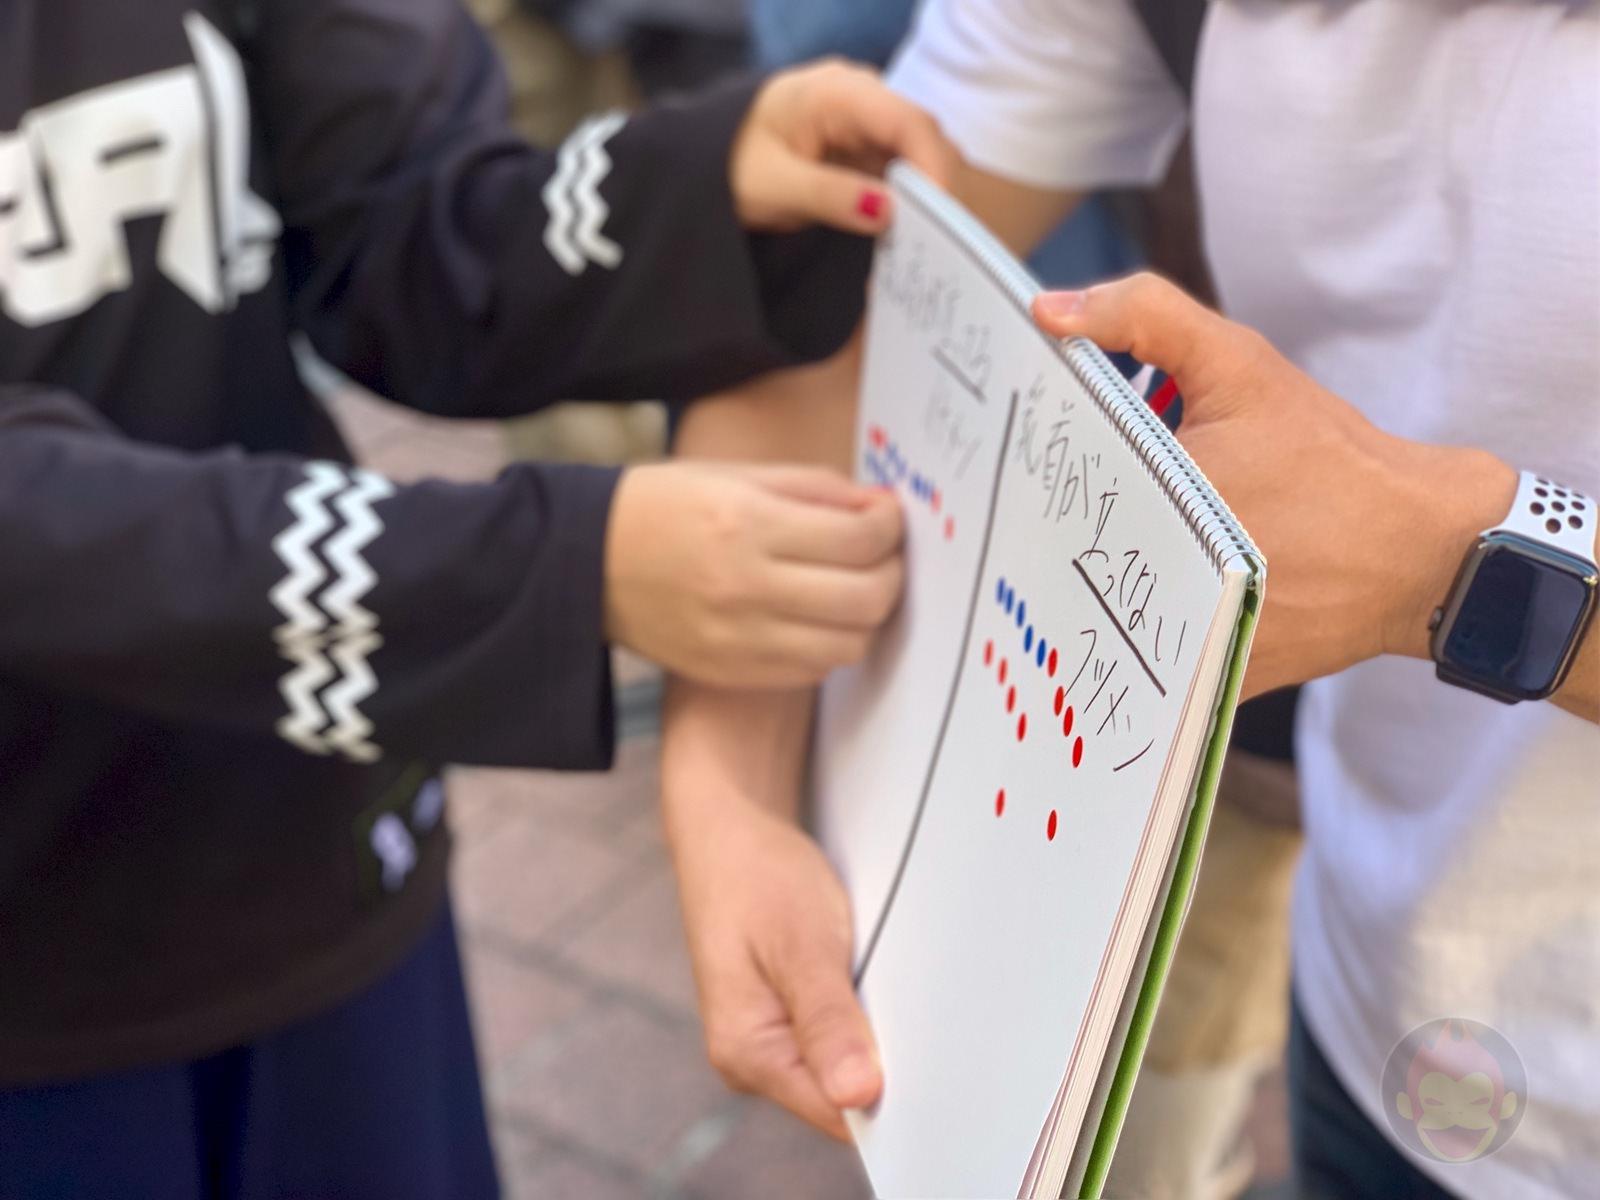 White-Tshirt-Questionare-at-Shibuya-Harajuku-21.jpg